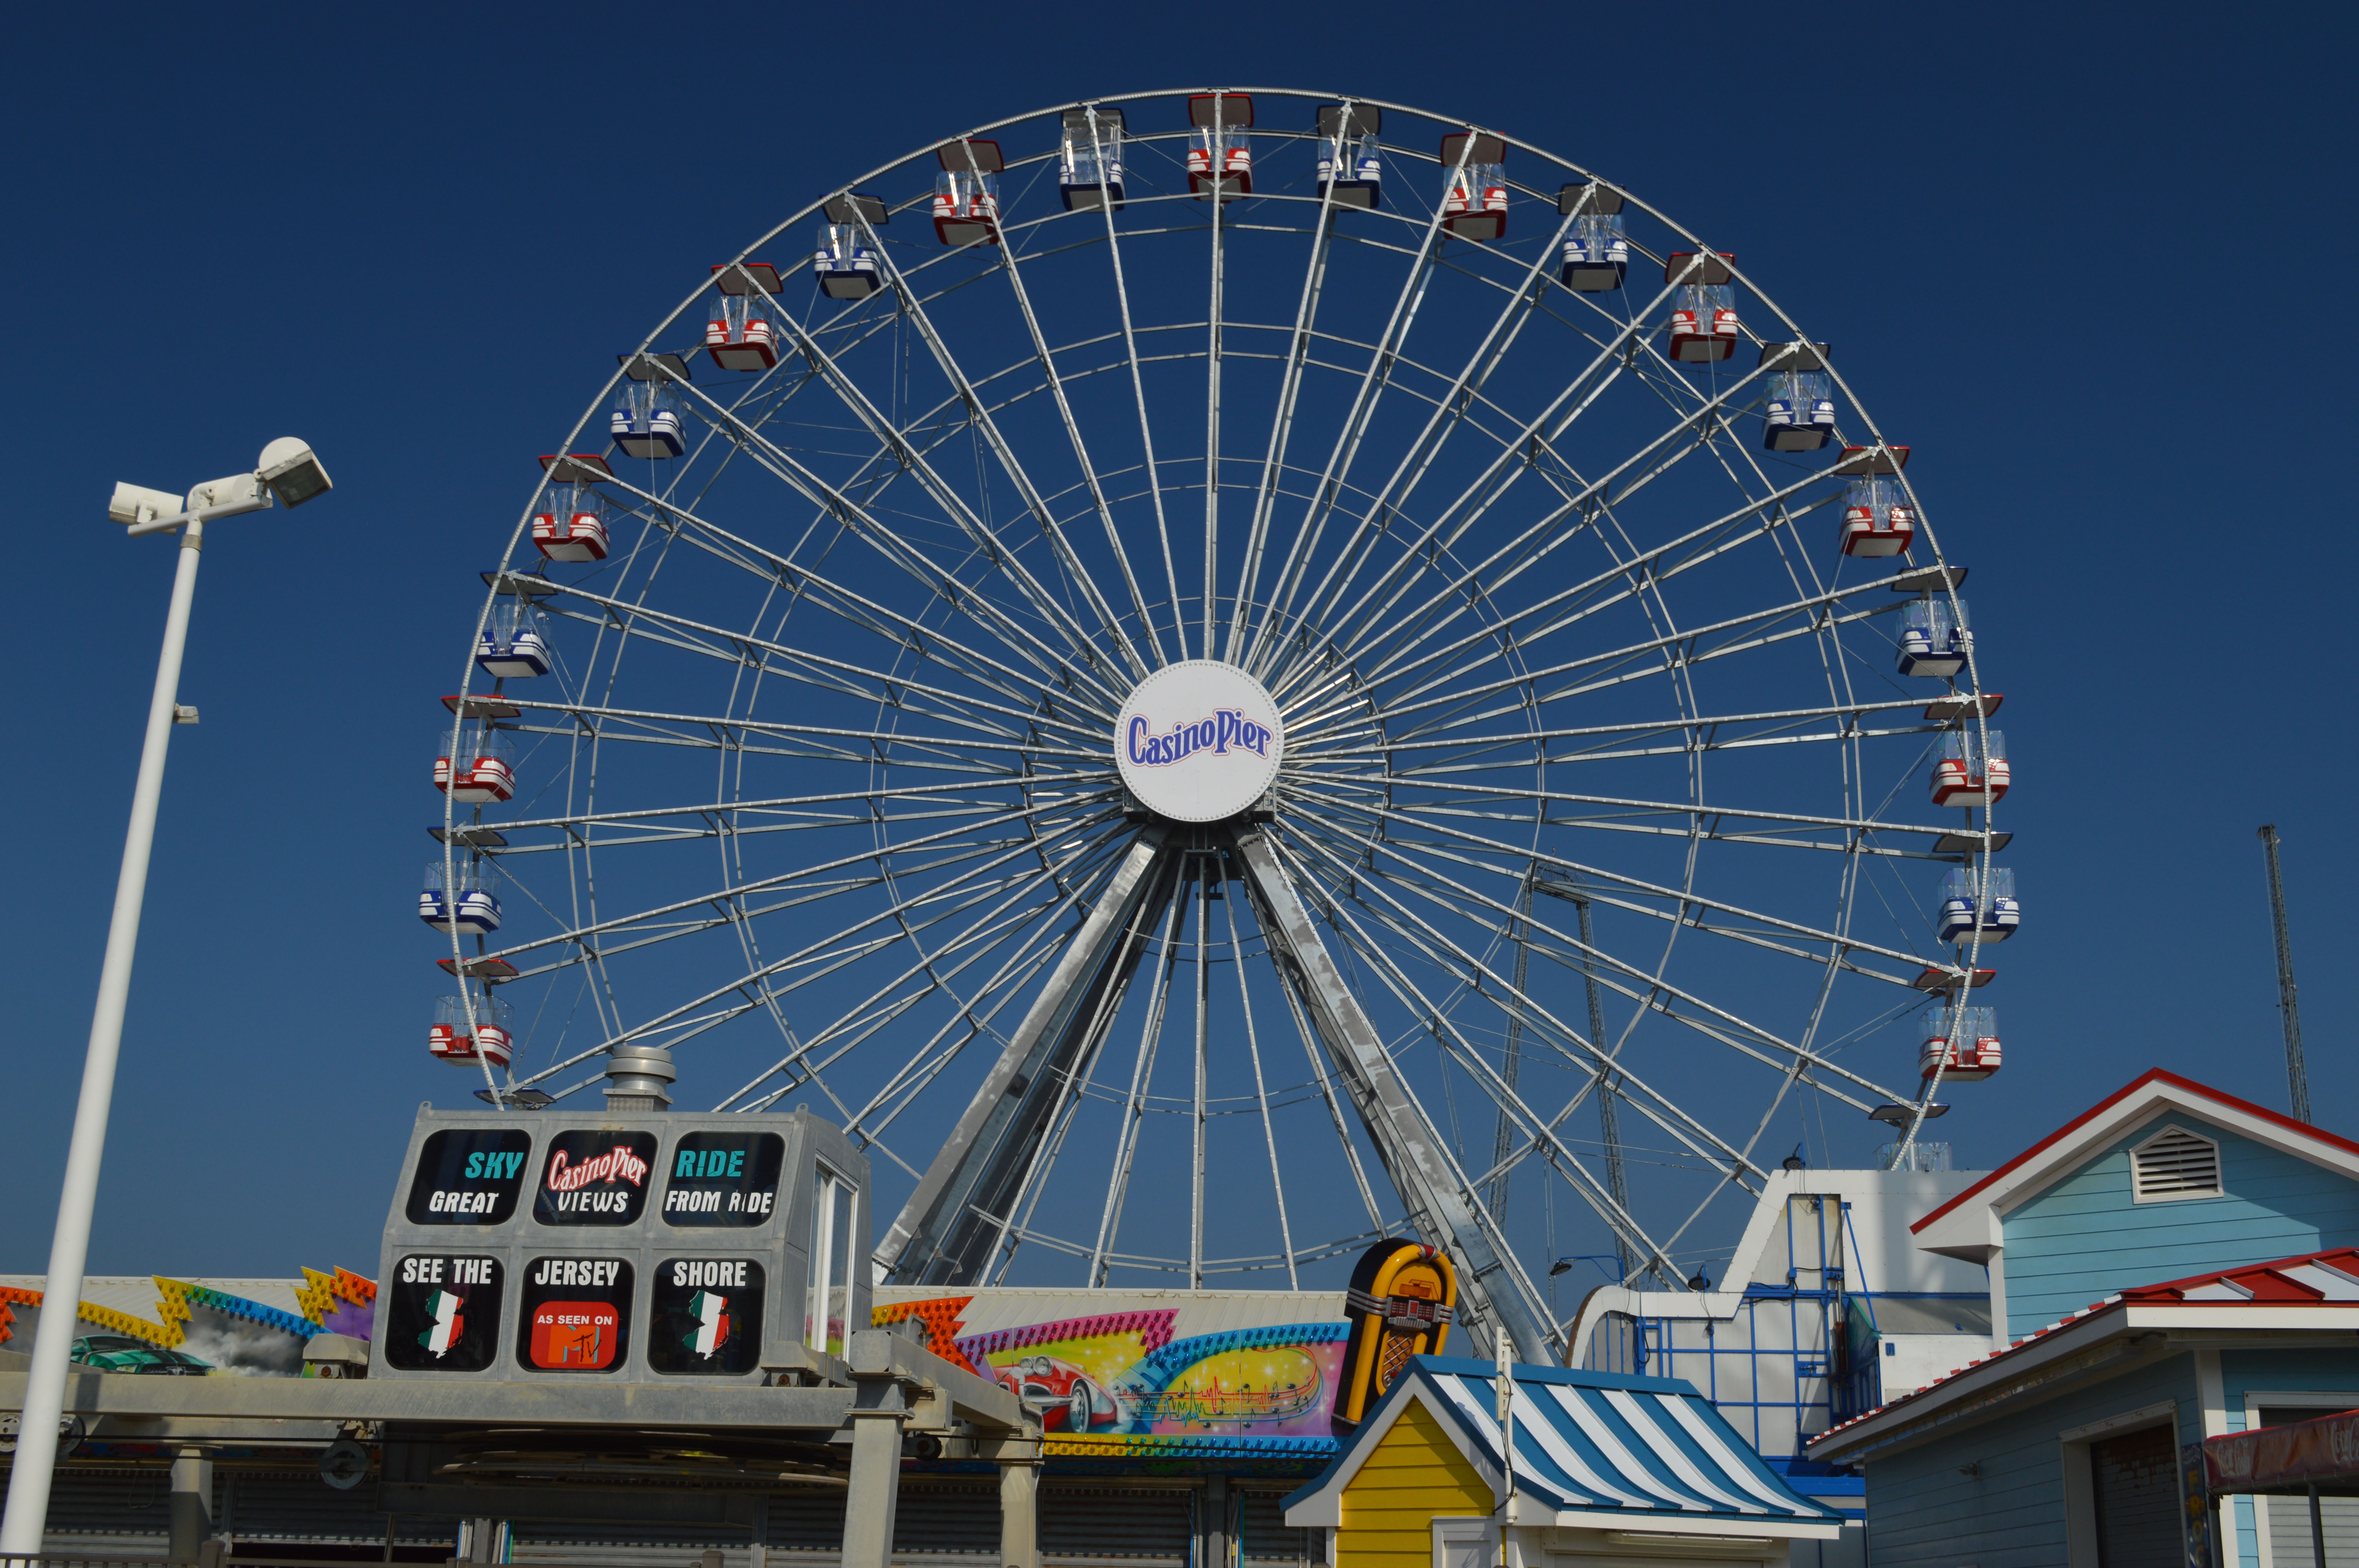 The new Ferris wheel at Casino Pier in Seaside Heights. (Photo: Daniel Nee)